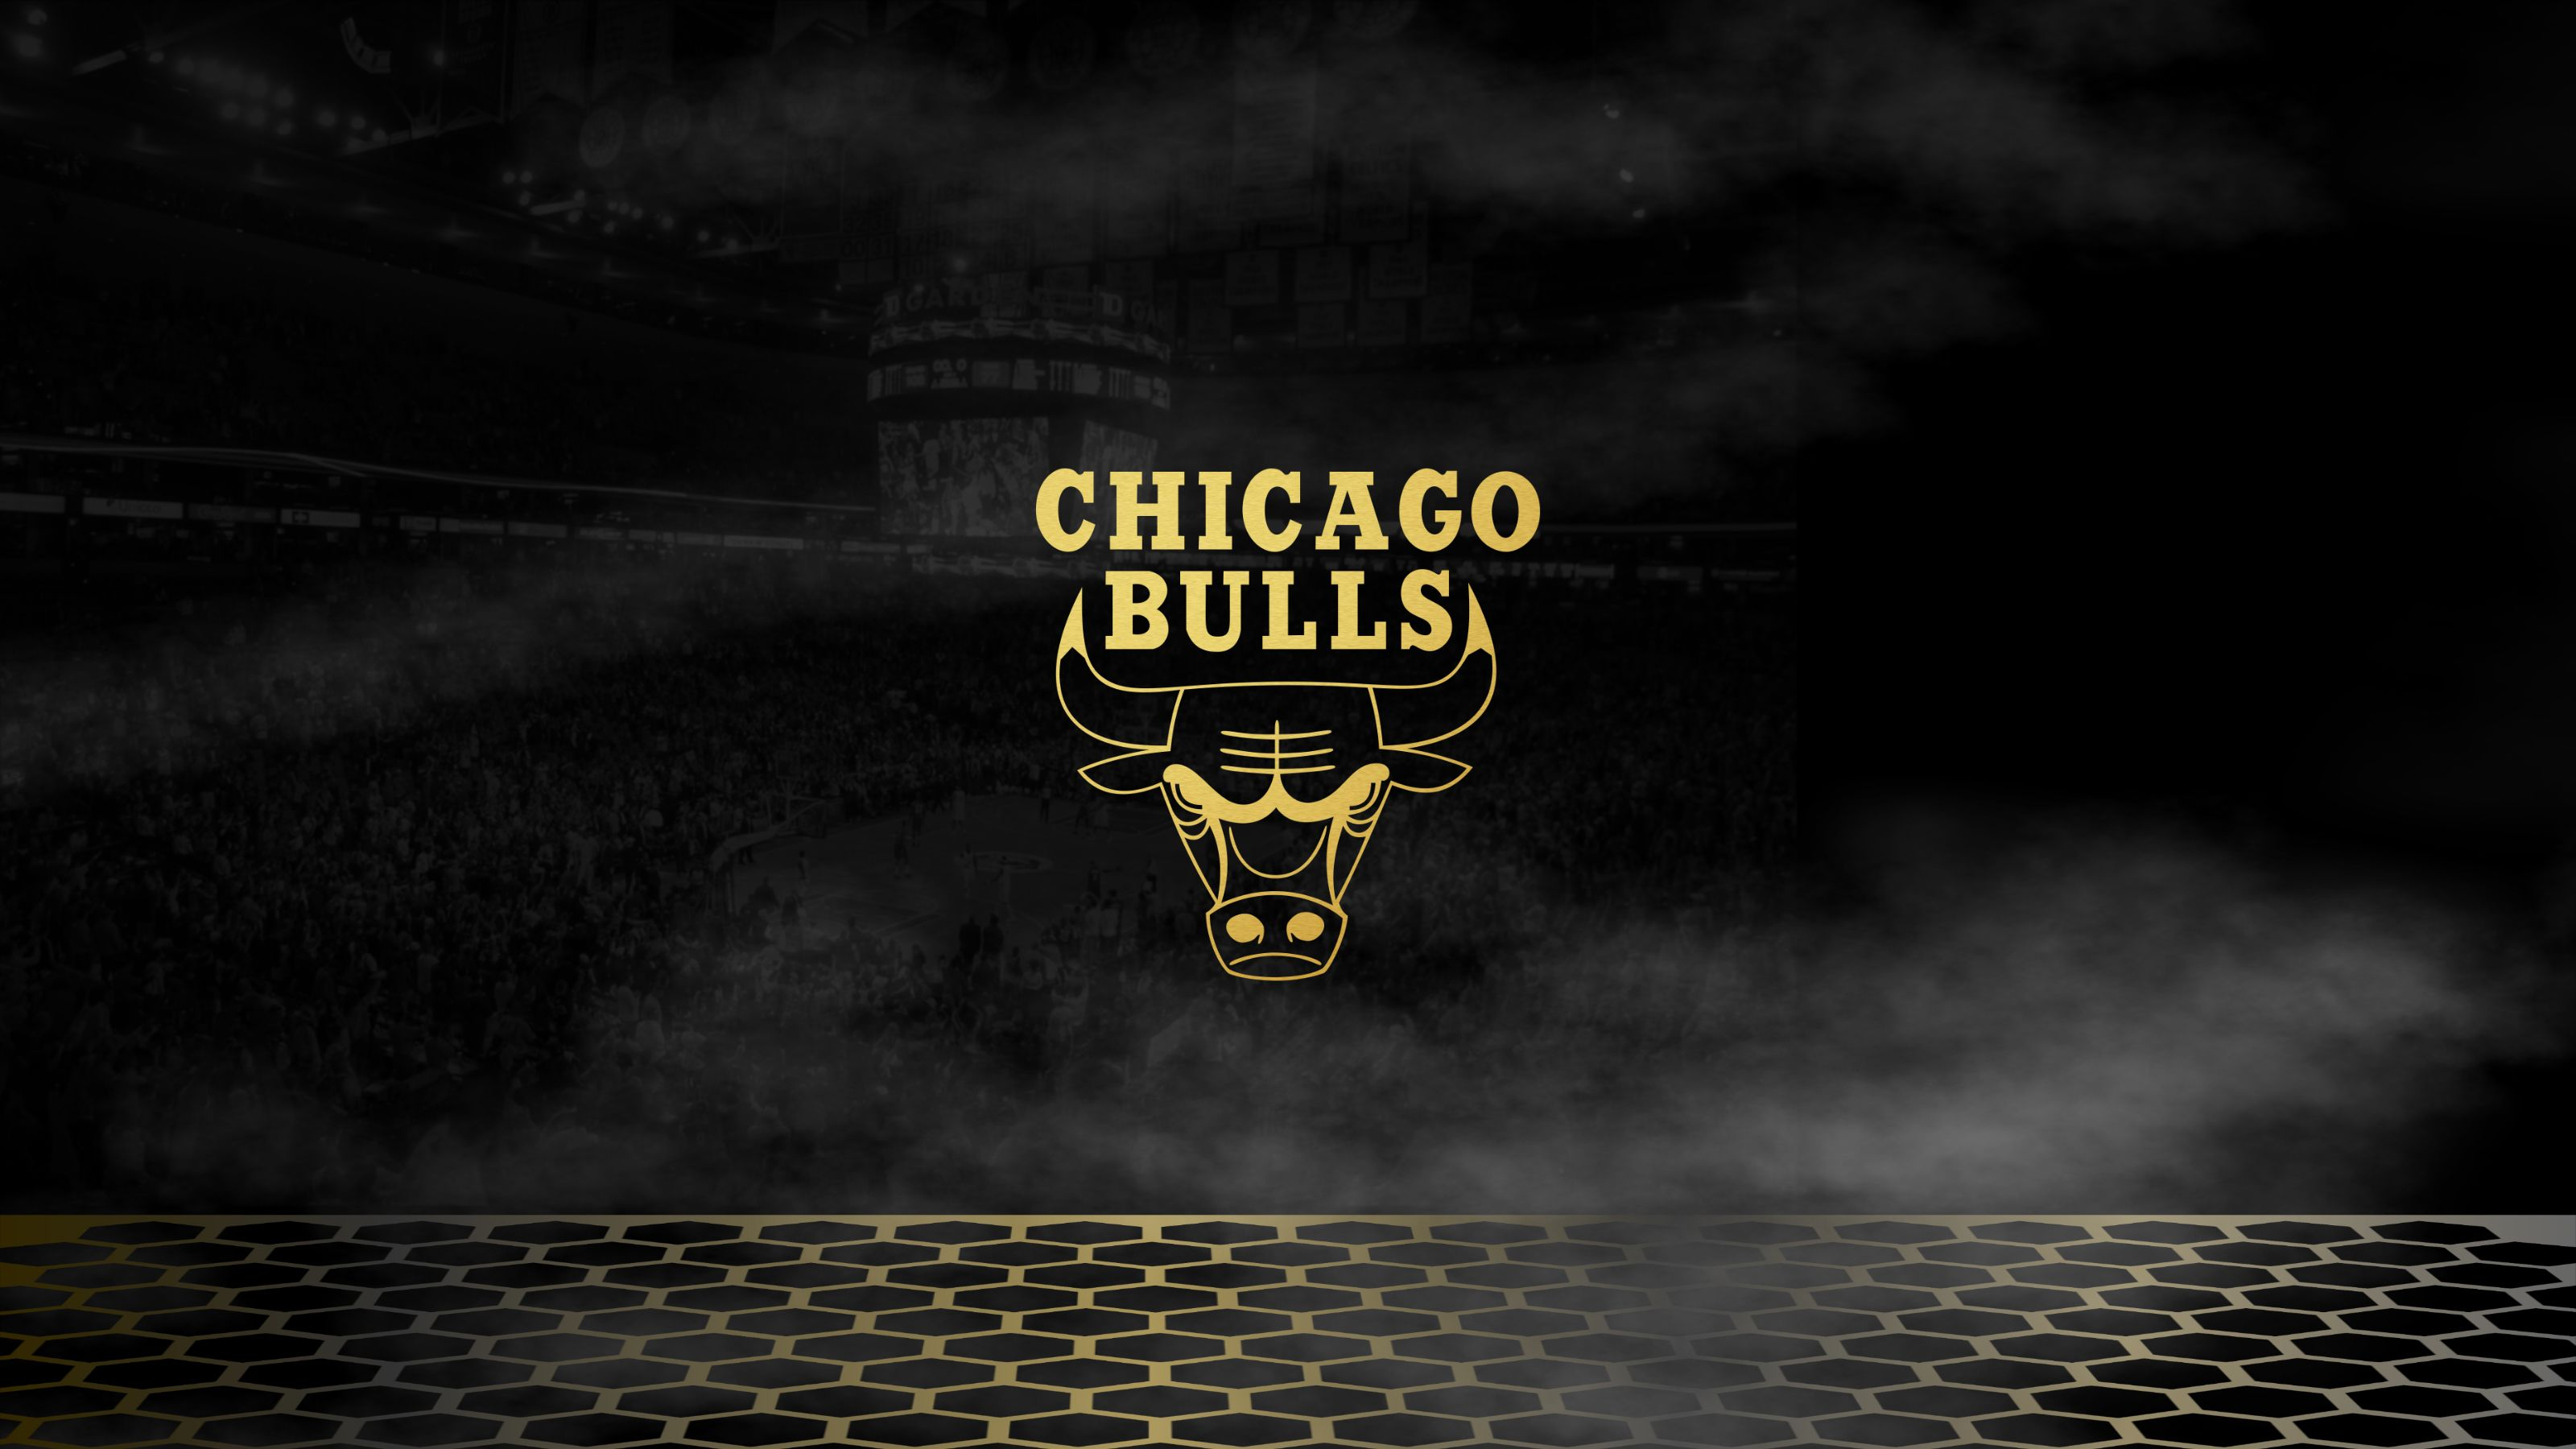 Chicago Bulls Desktop Background Nba Wallpaper In 2020 Chicago Bulls Bulls Wallpaper Chicago Bulls Wallpaper